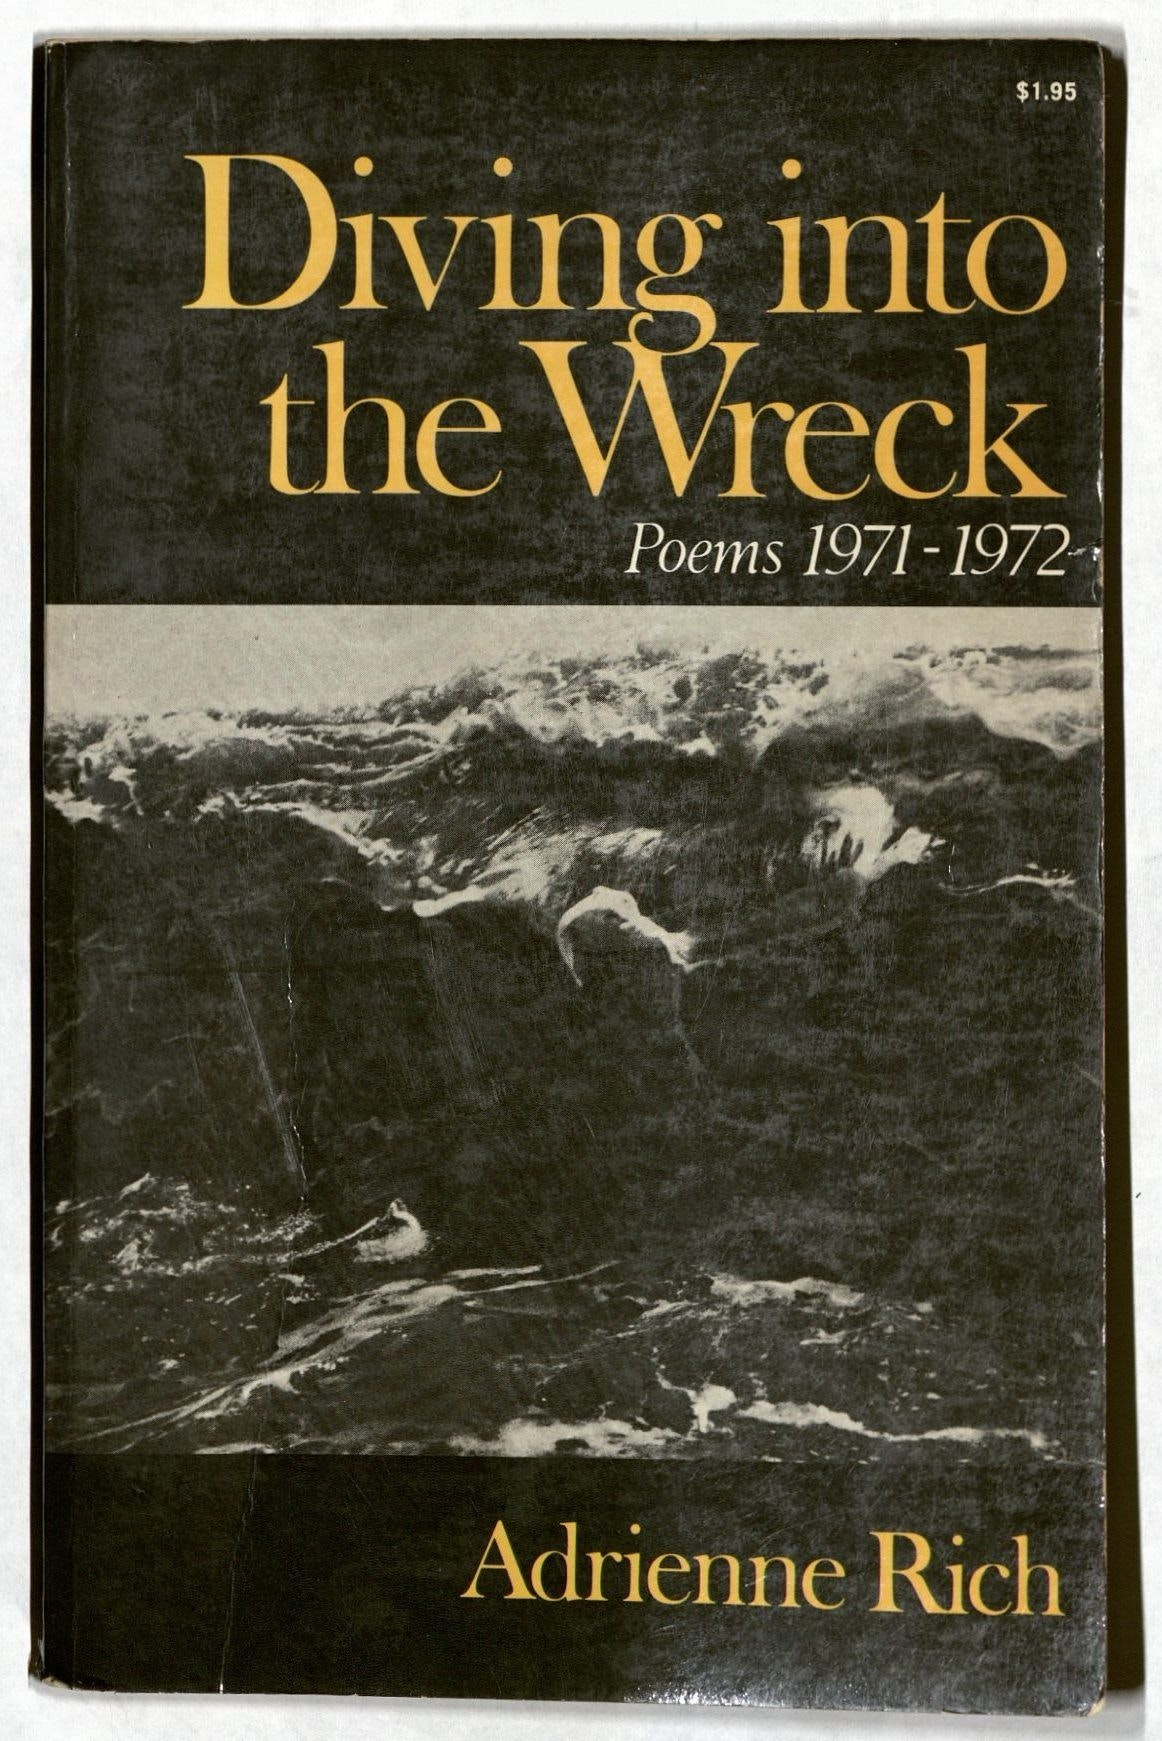 Book by Adrienne Rich